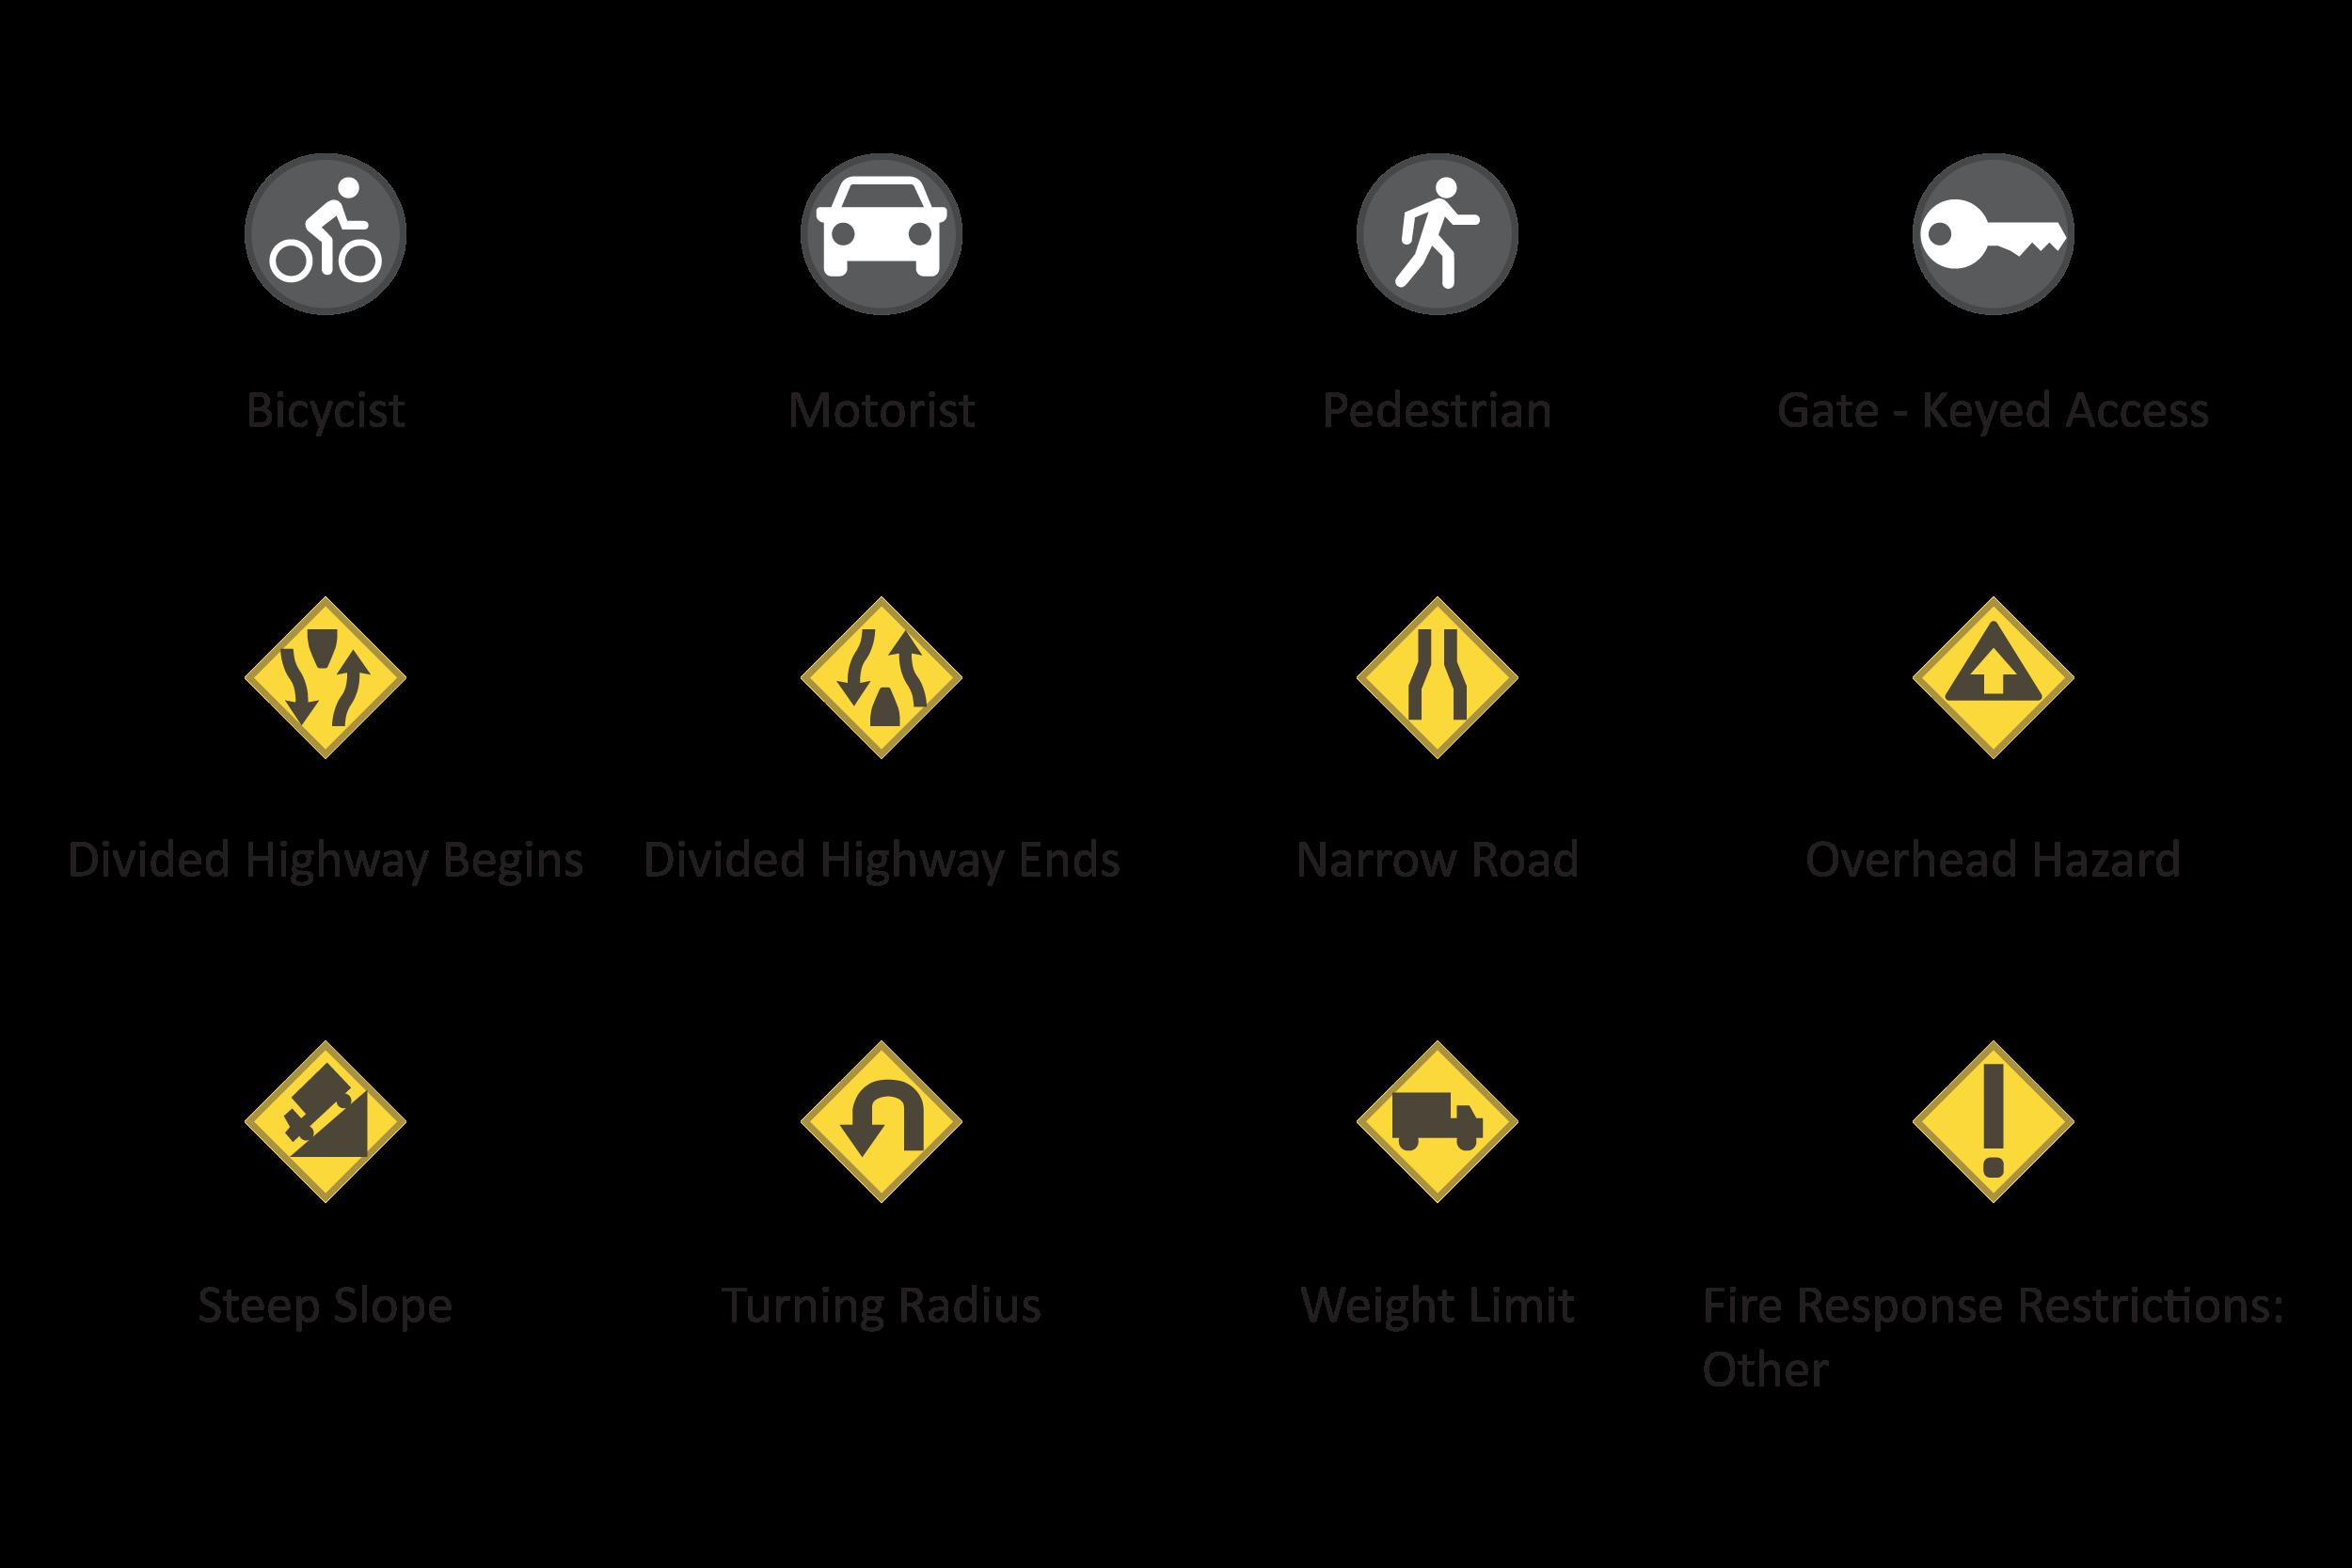 New Local Government Symbols